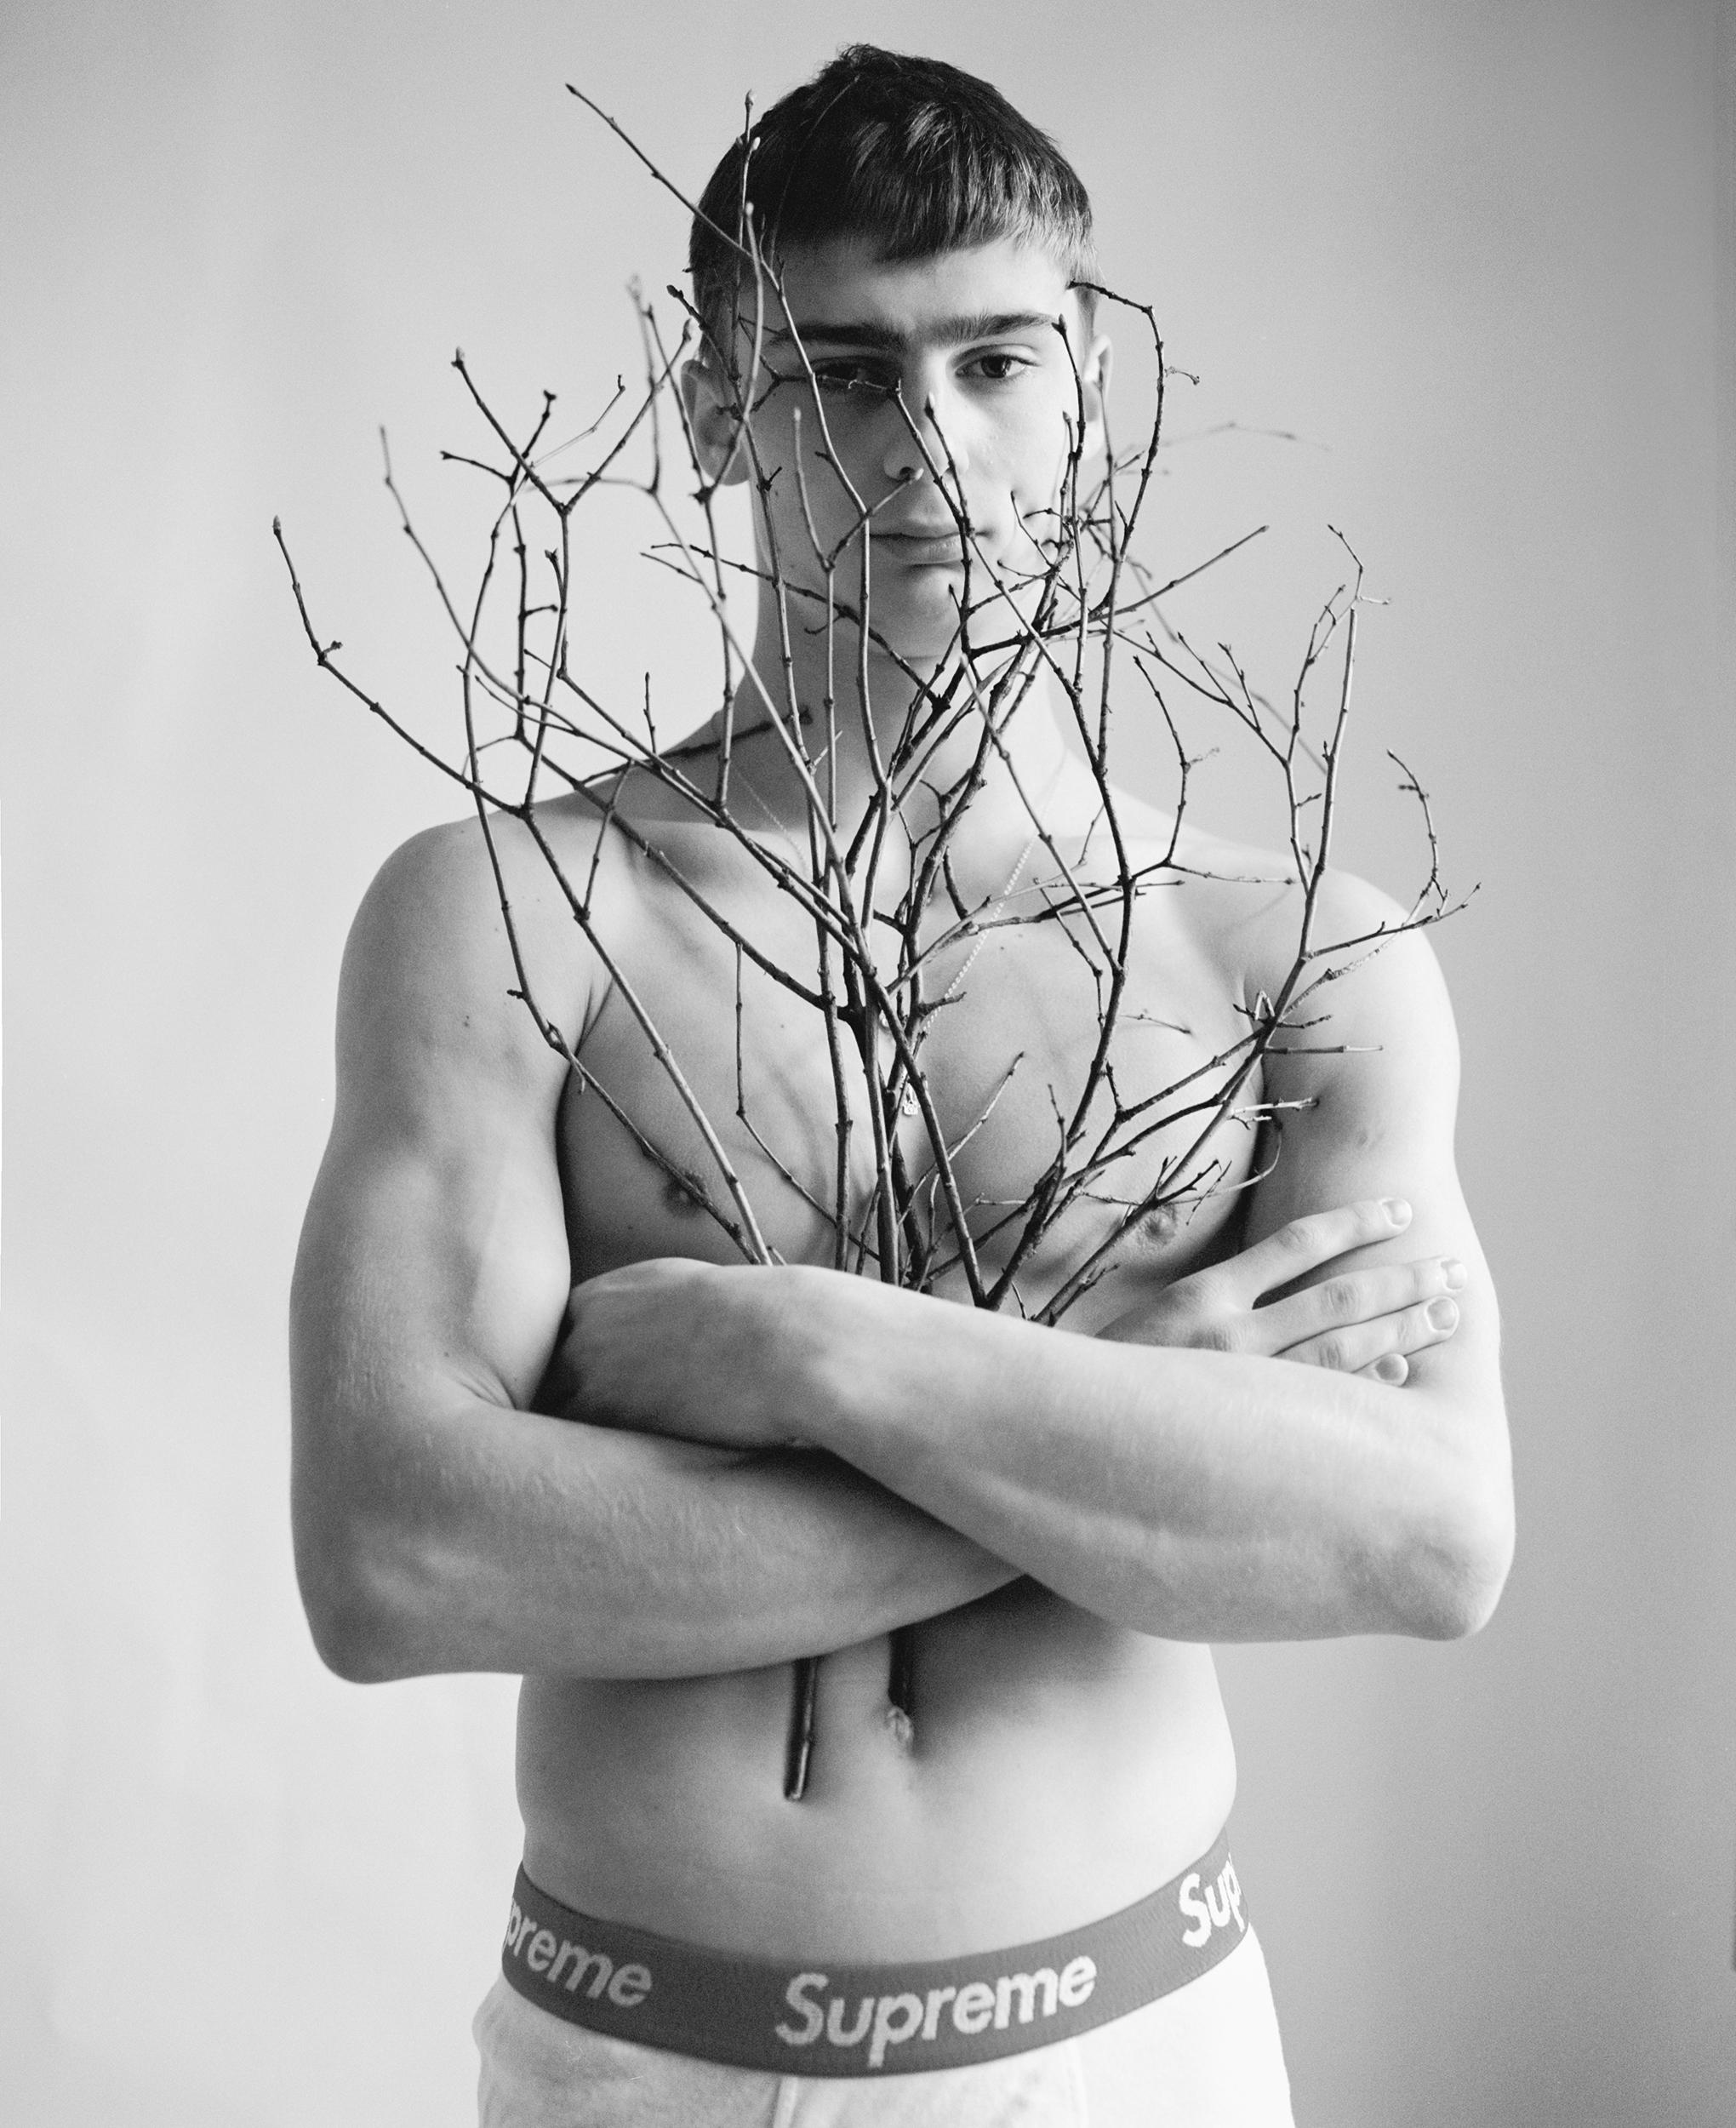 Work by Bogdan Shirokov